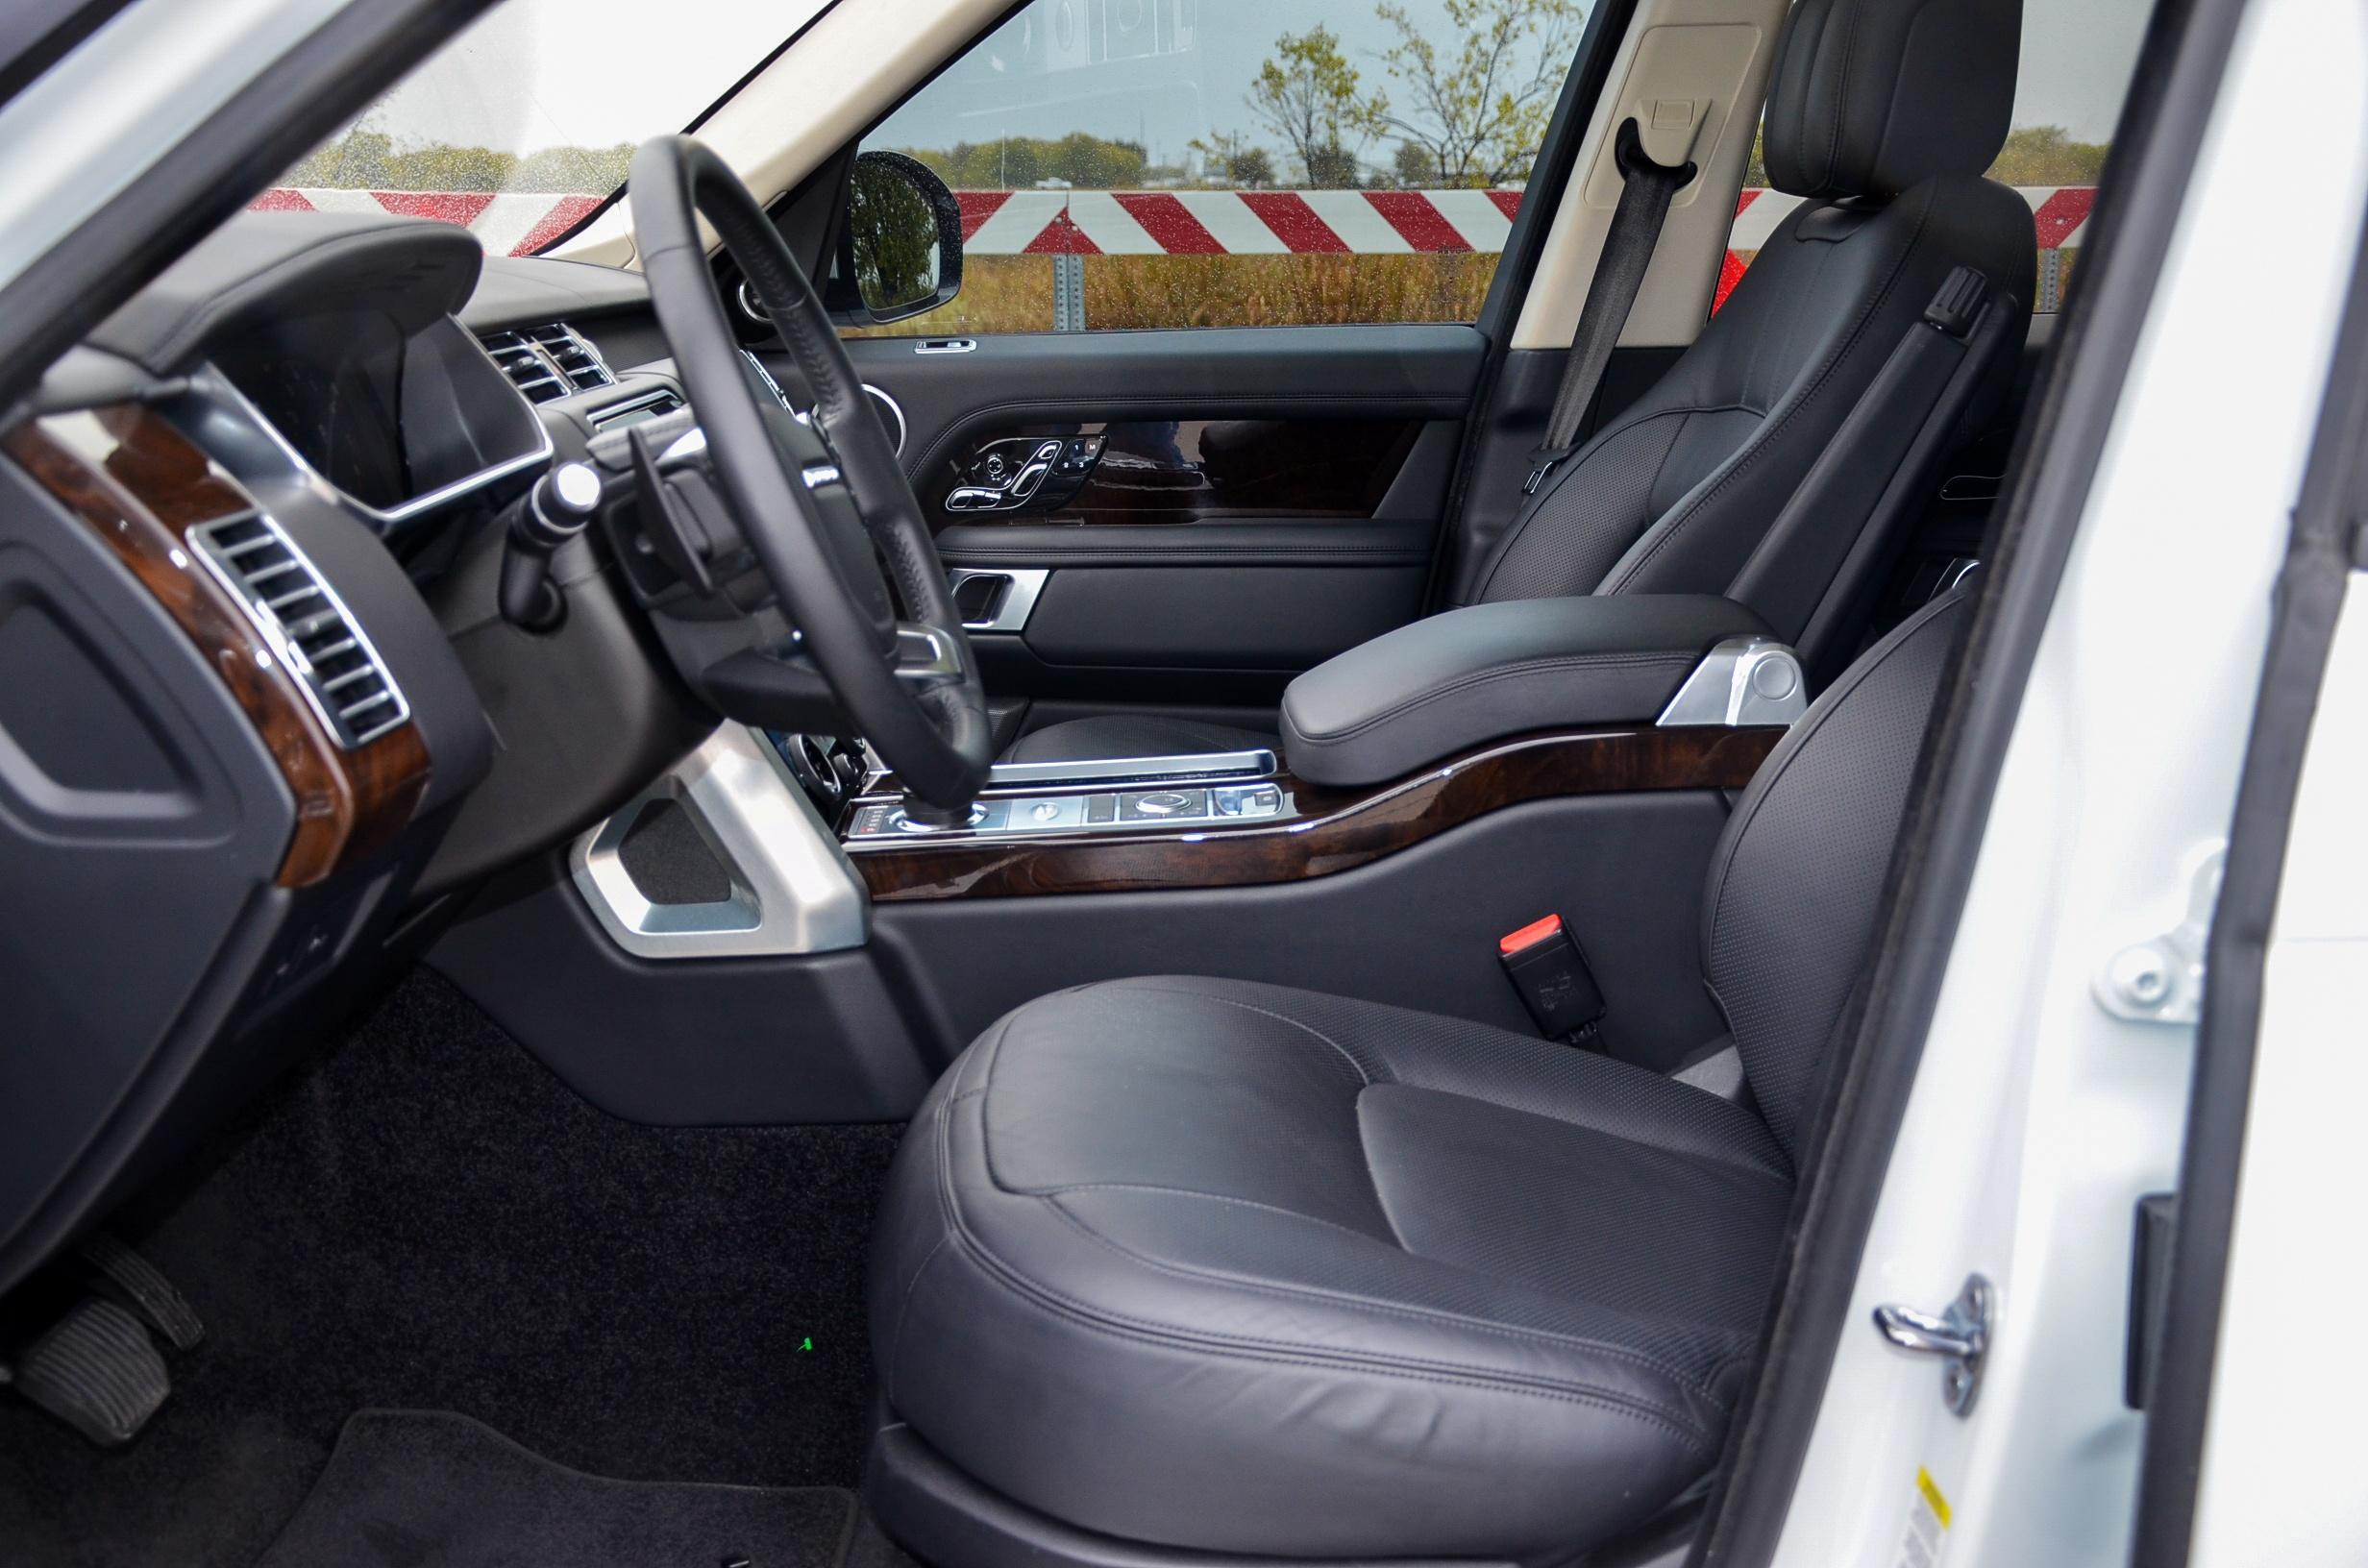 Land Rover White Range Rover